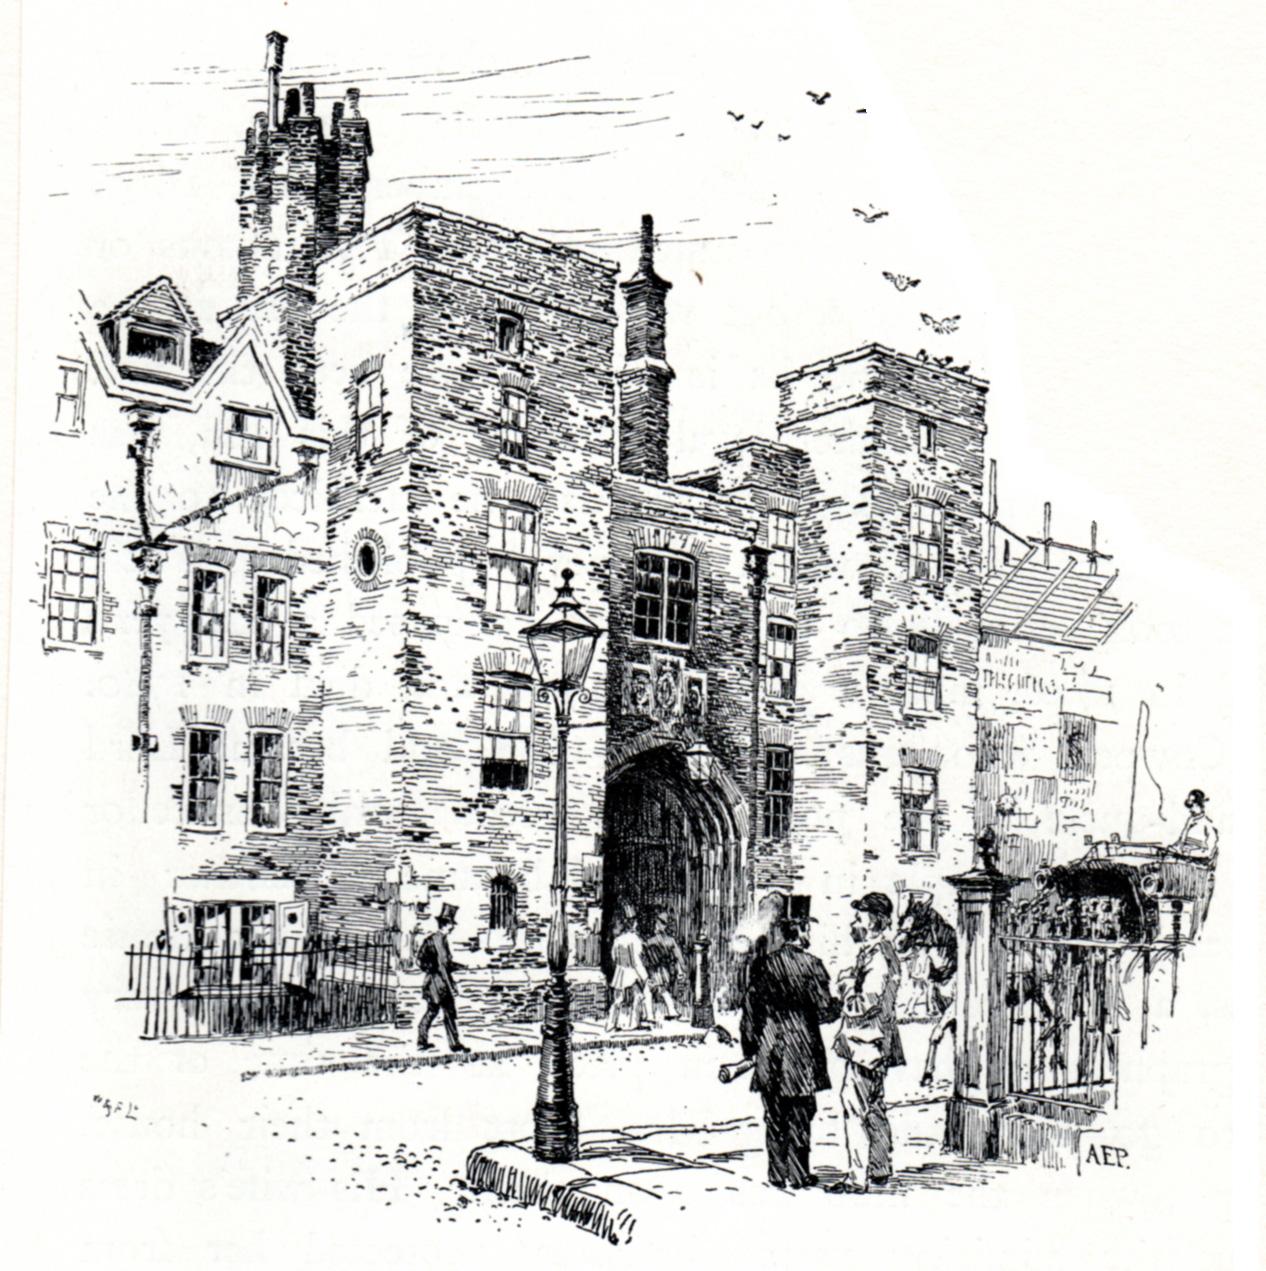 Inns of Court & Chancery